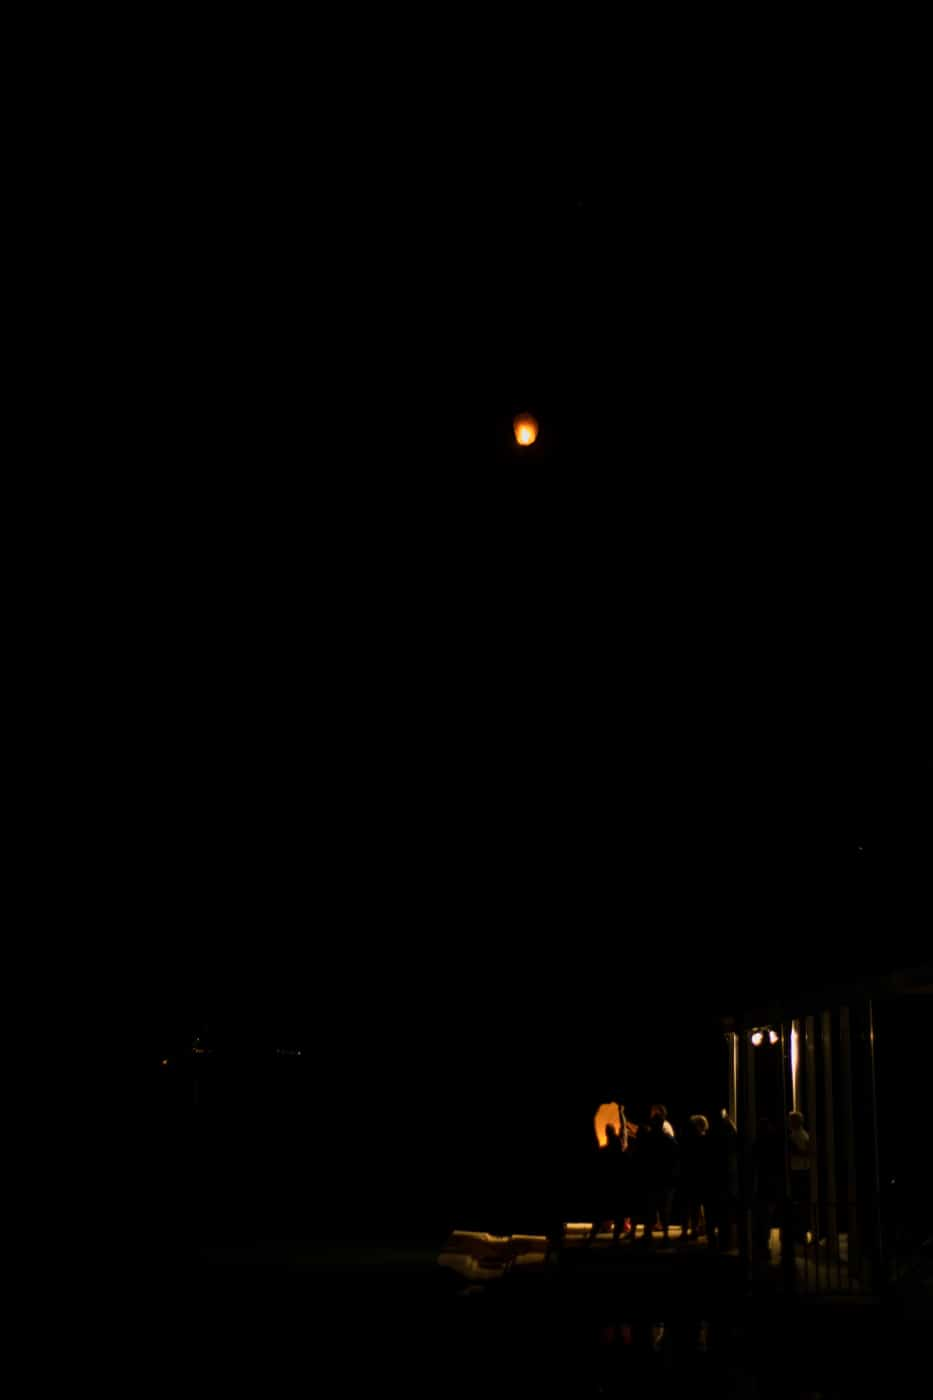 family releases memorial lanterns